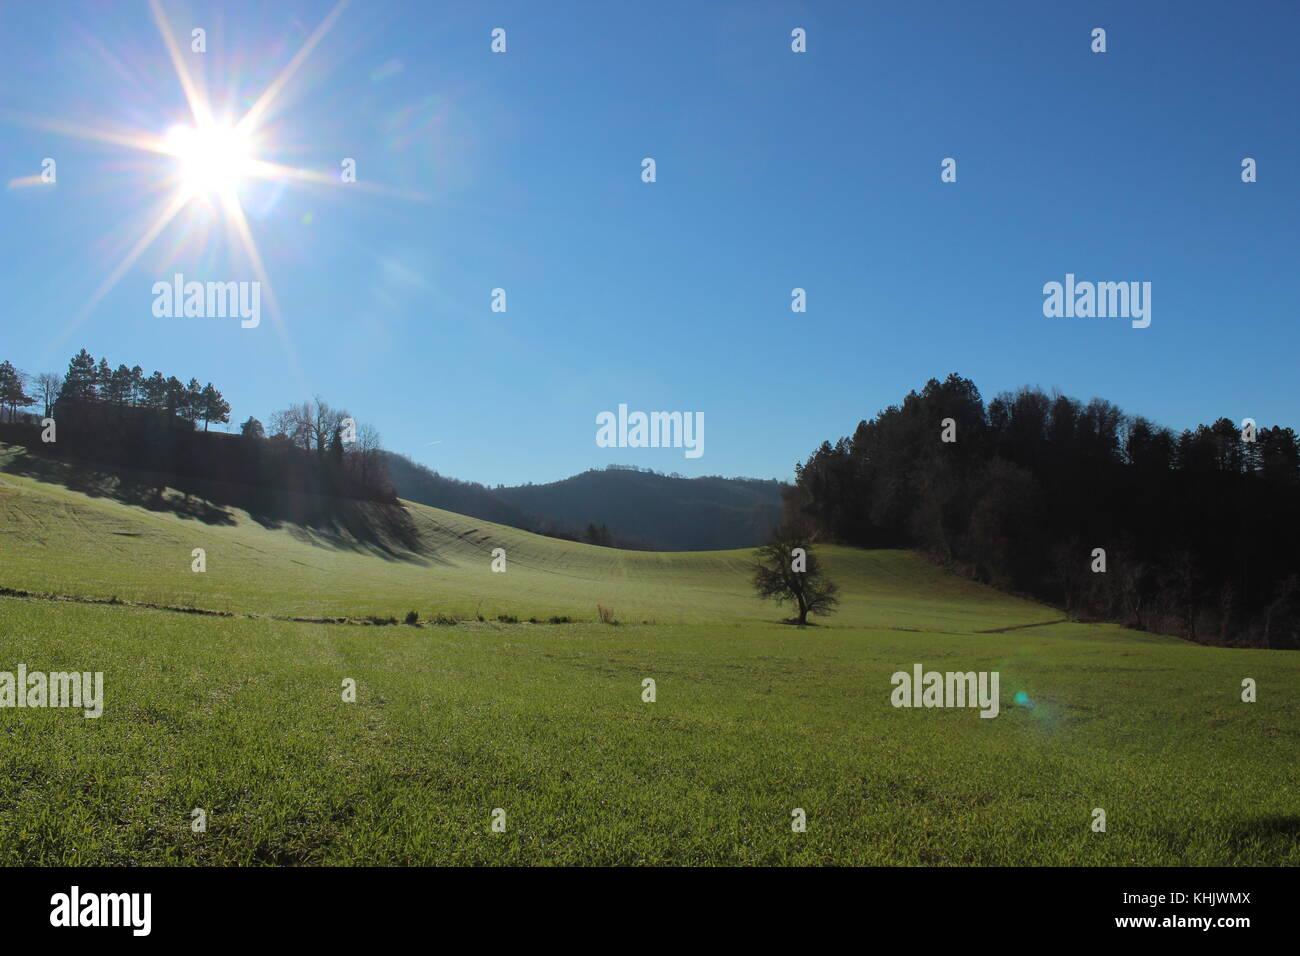 Landscape hill - Stock Image